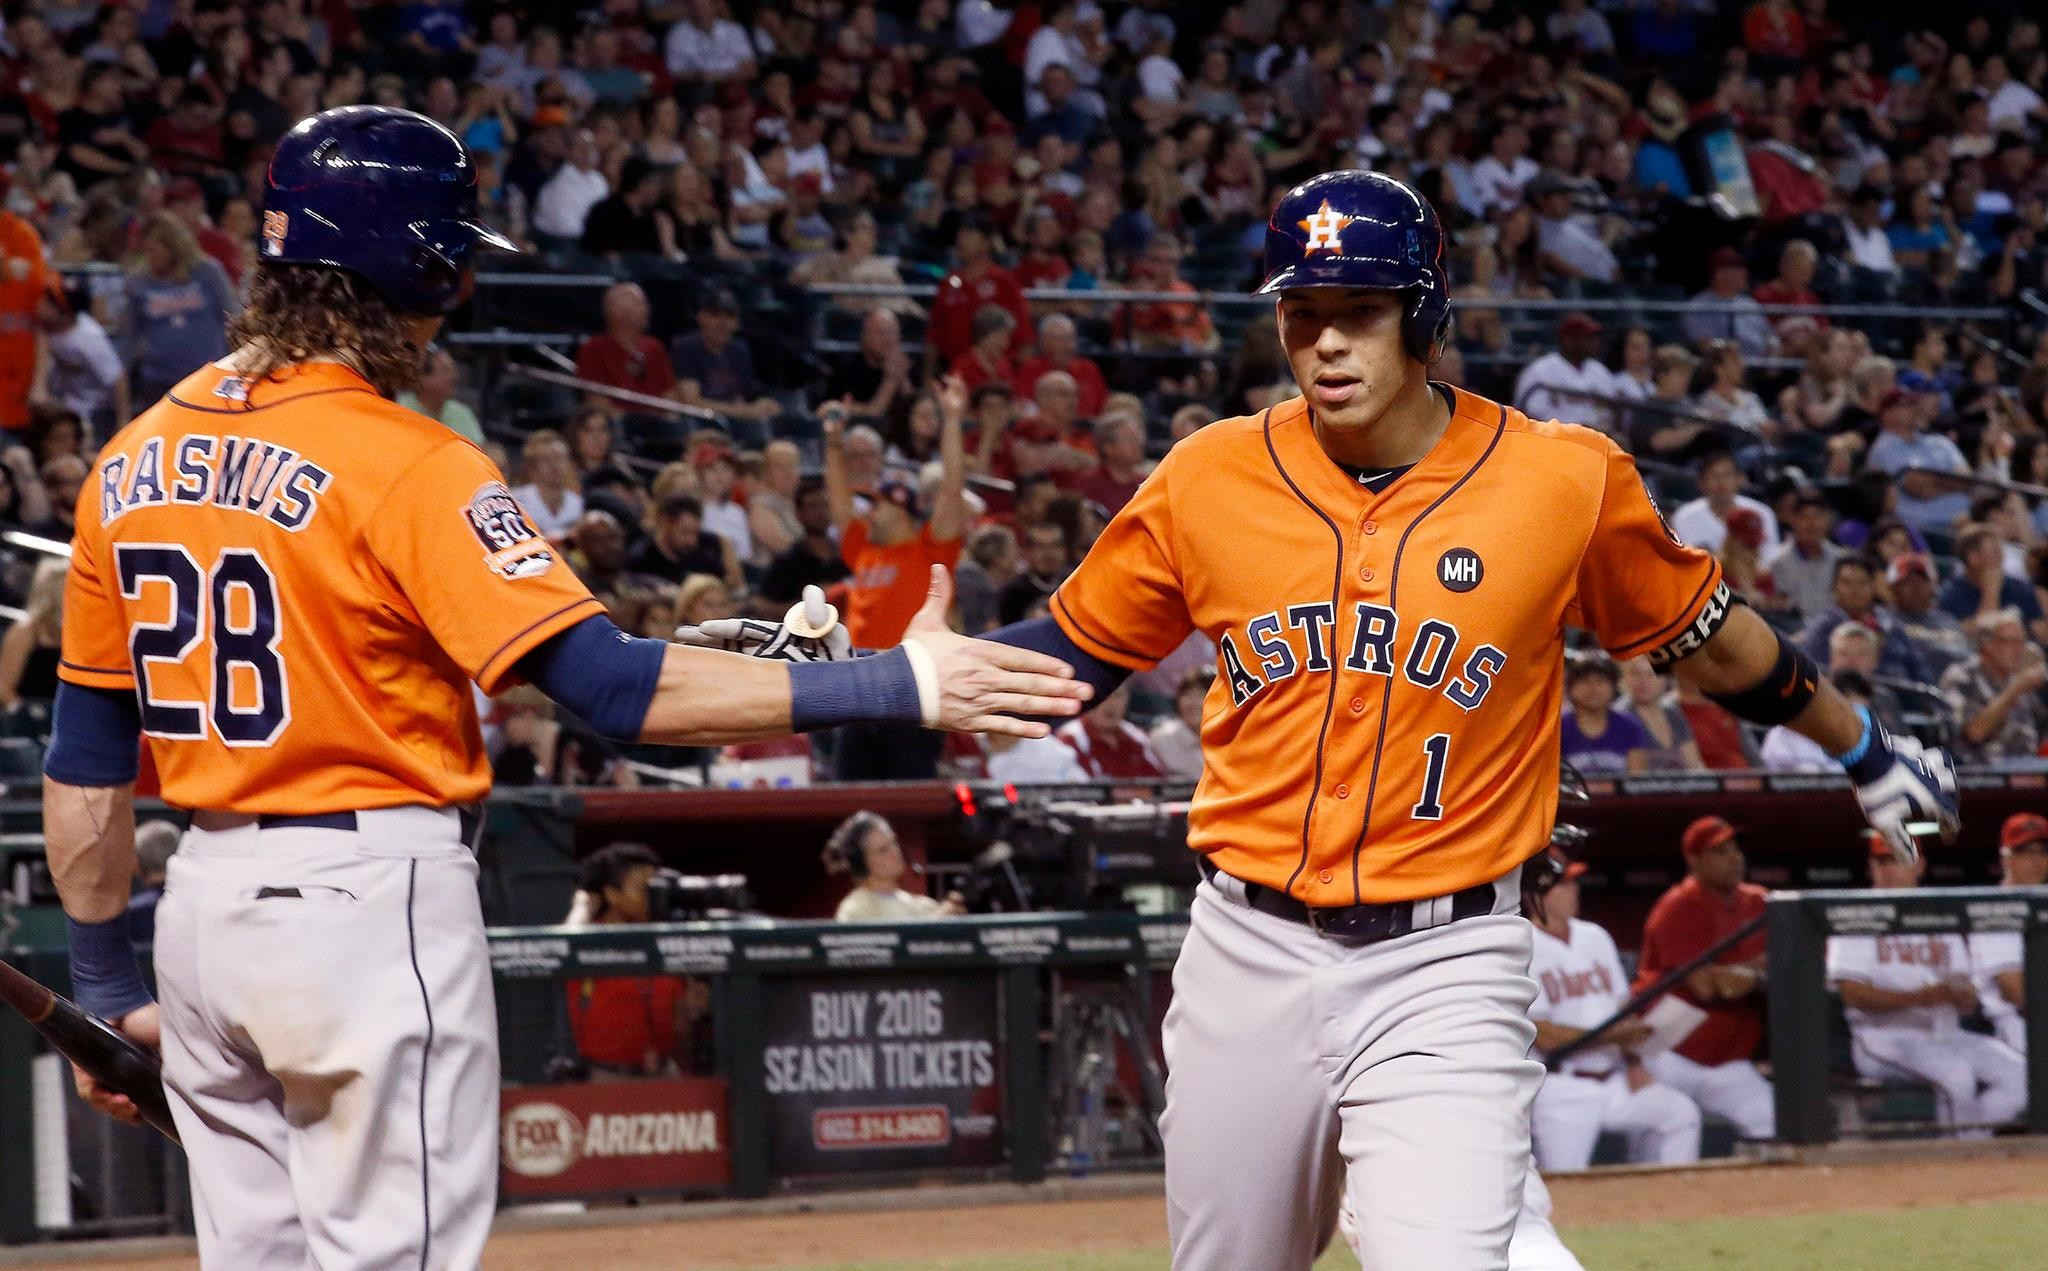 Colby Rasmus congratulates Carlos Correa after a record-breaking 22nd  homerun of the season.